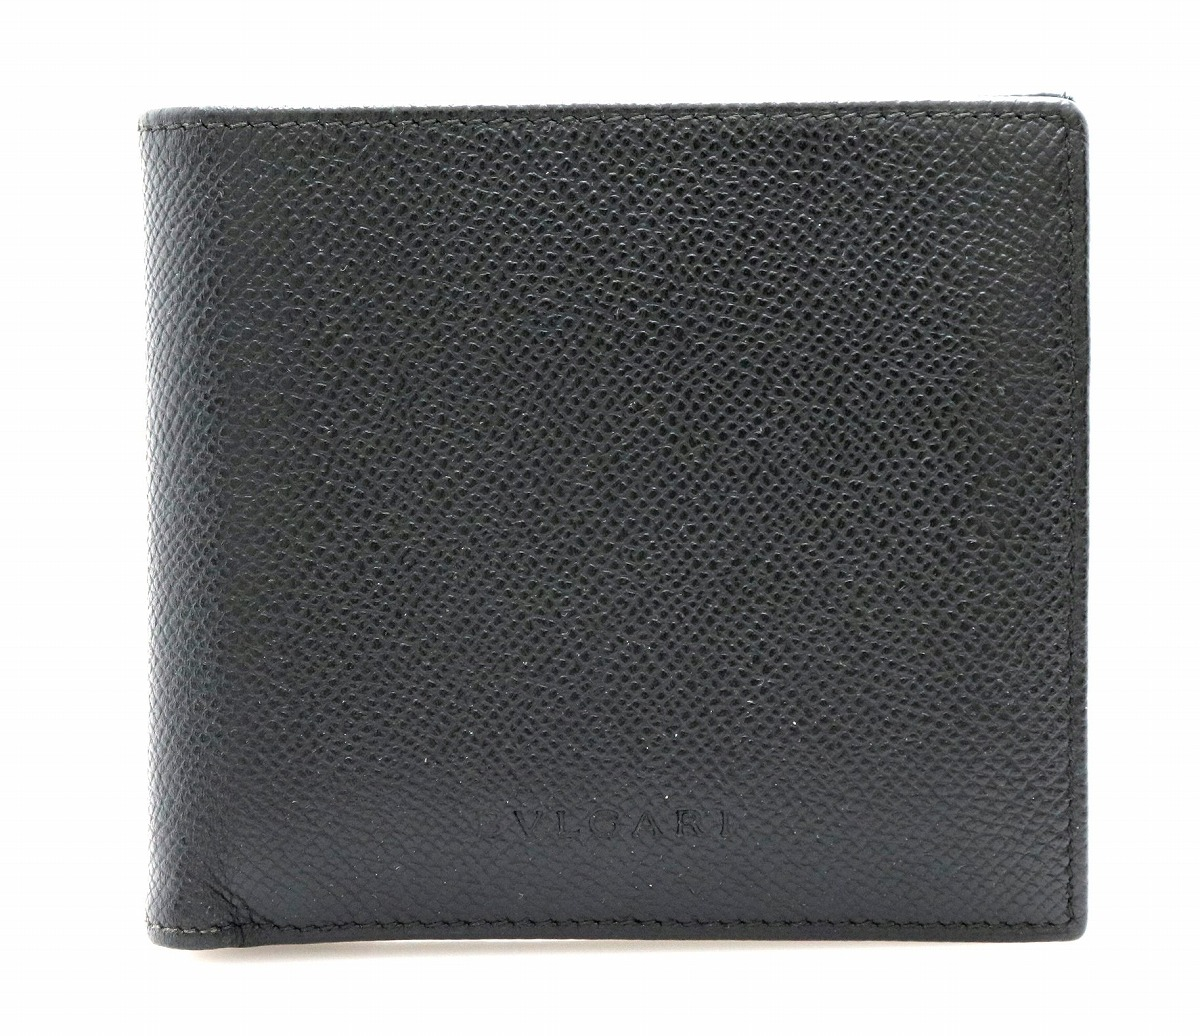 d2e572b05eab 【財布】BVLGARI ブルガリ グレインレザー 2つ折財布 黒 ブラック 20253 【中古】